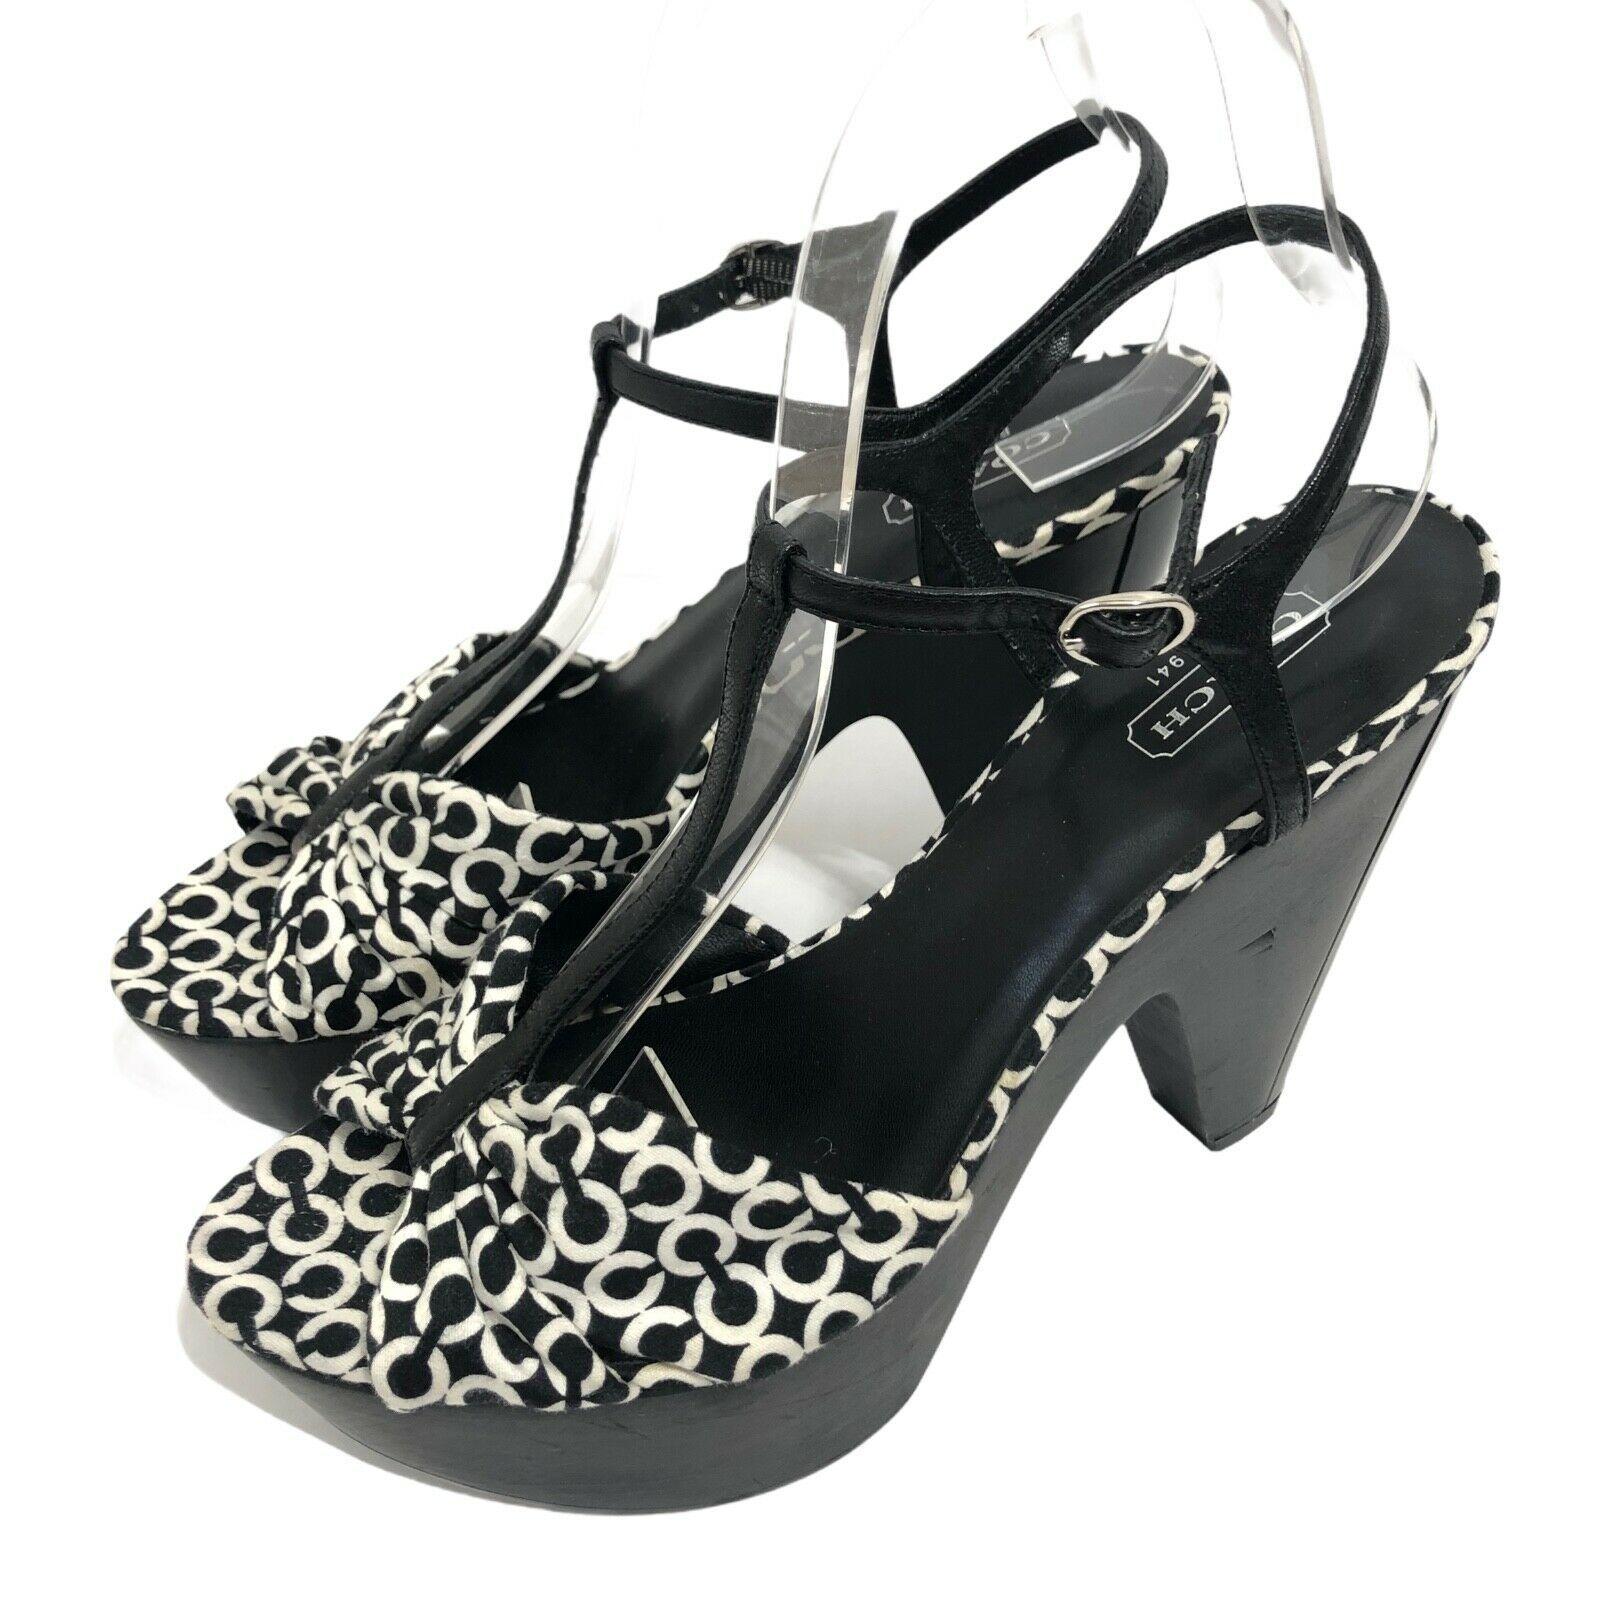 Coach Janeen OP Art Ankle Strap Sandals Platform Heels Womens 7.5 Black & White - $36.75